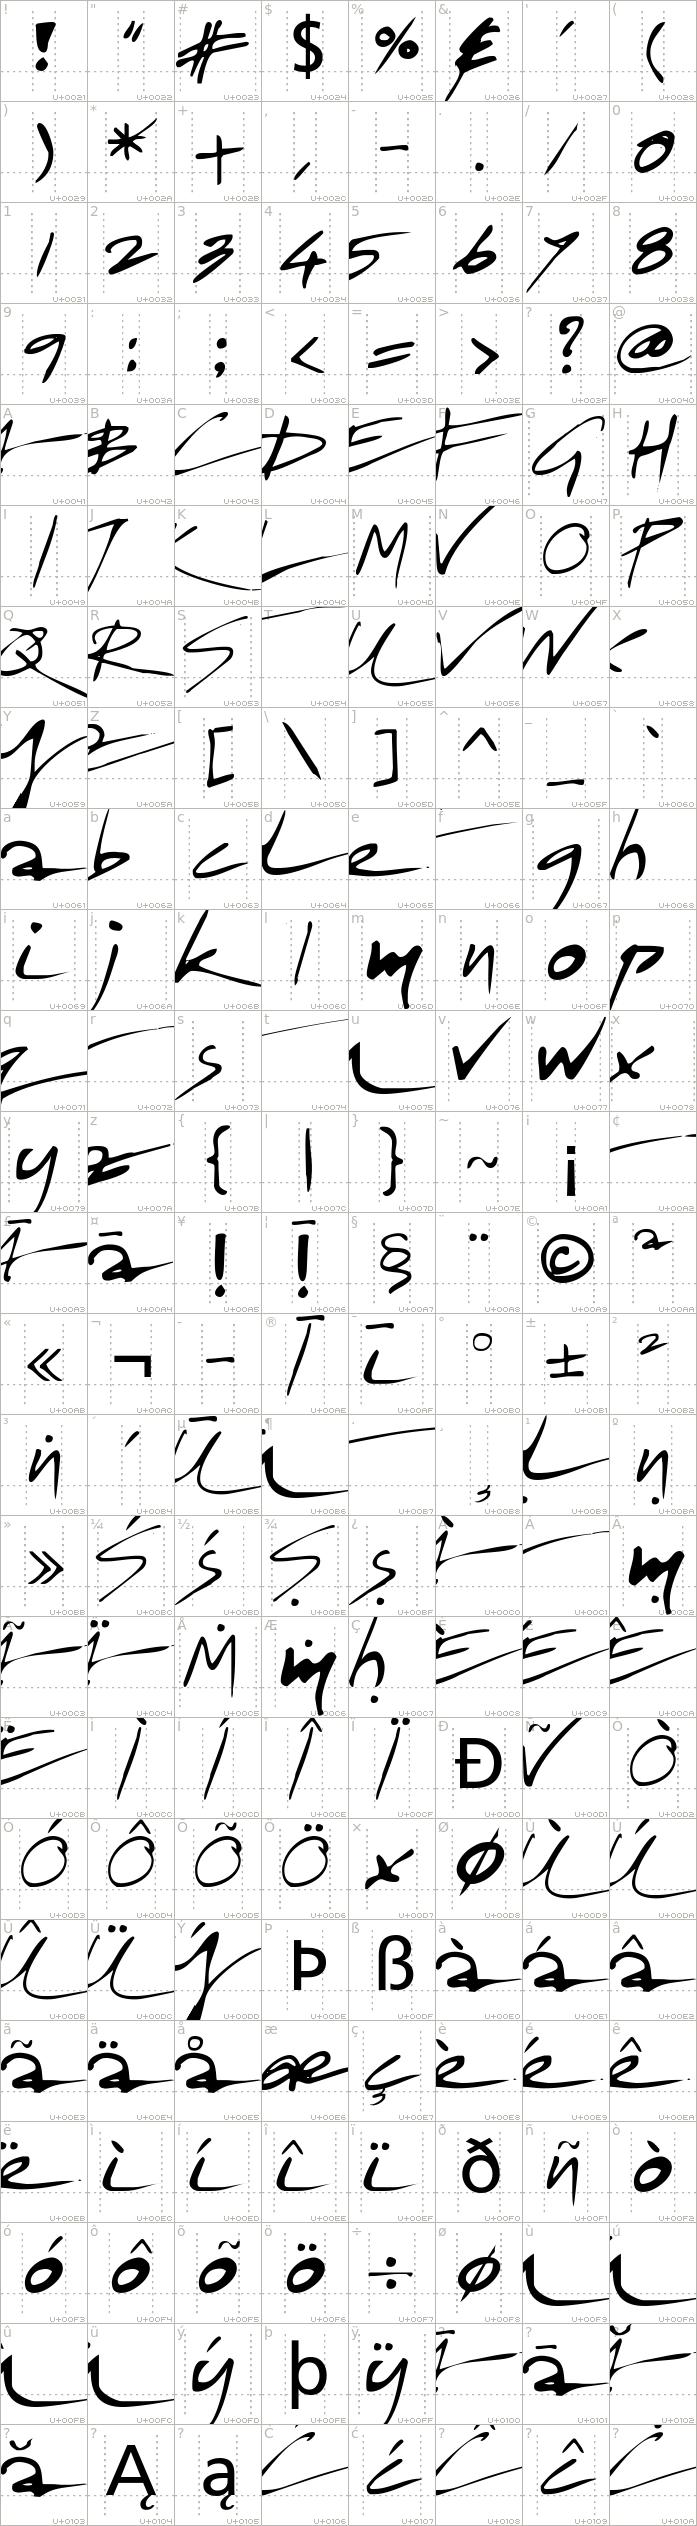 jayadhira-lila-ee-0-1.regular.character-map-1